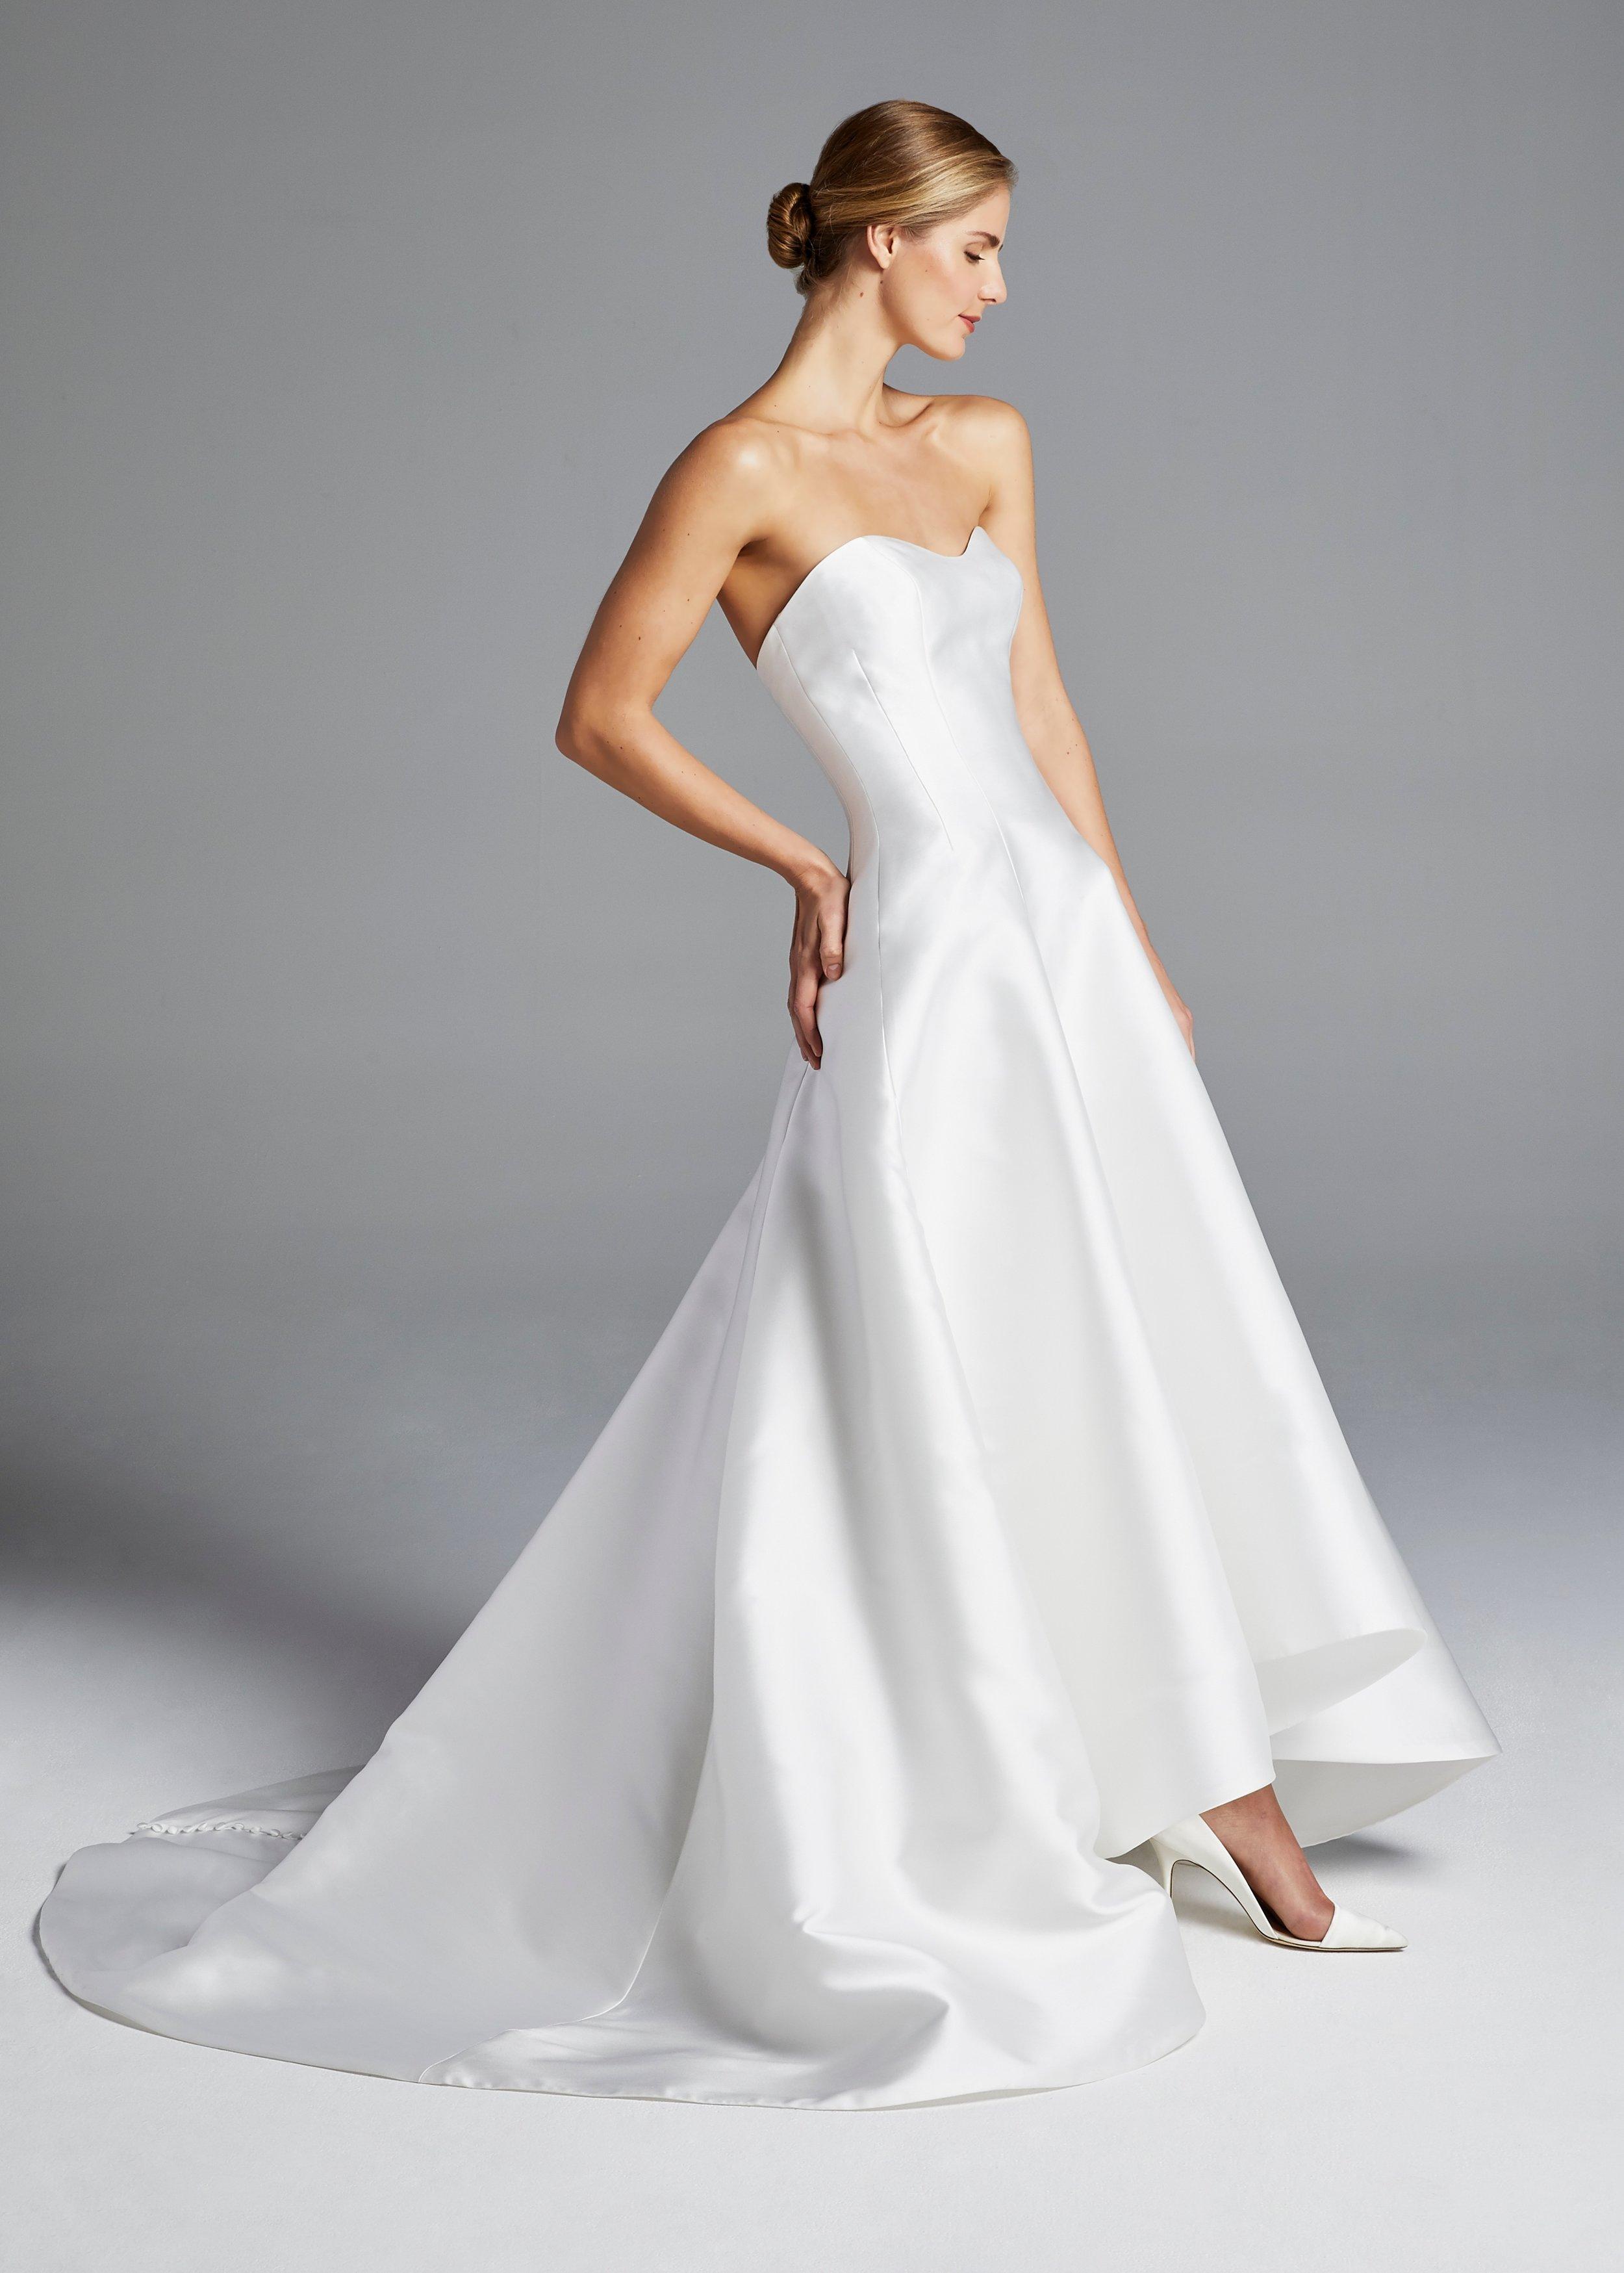 ANNE BARGE - SPRING 2019 - NEW YORK BRIDAL FASHION WEEK